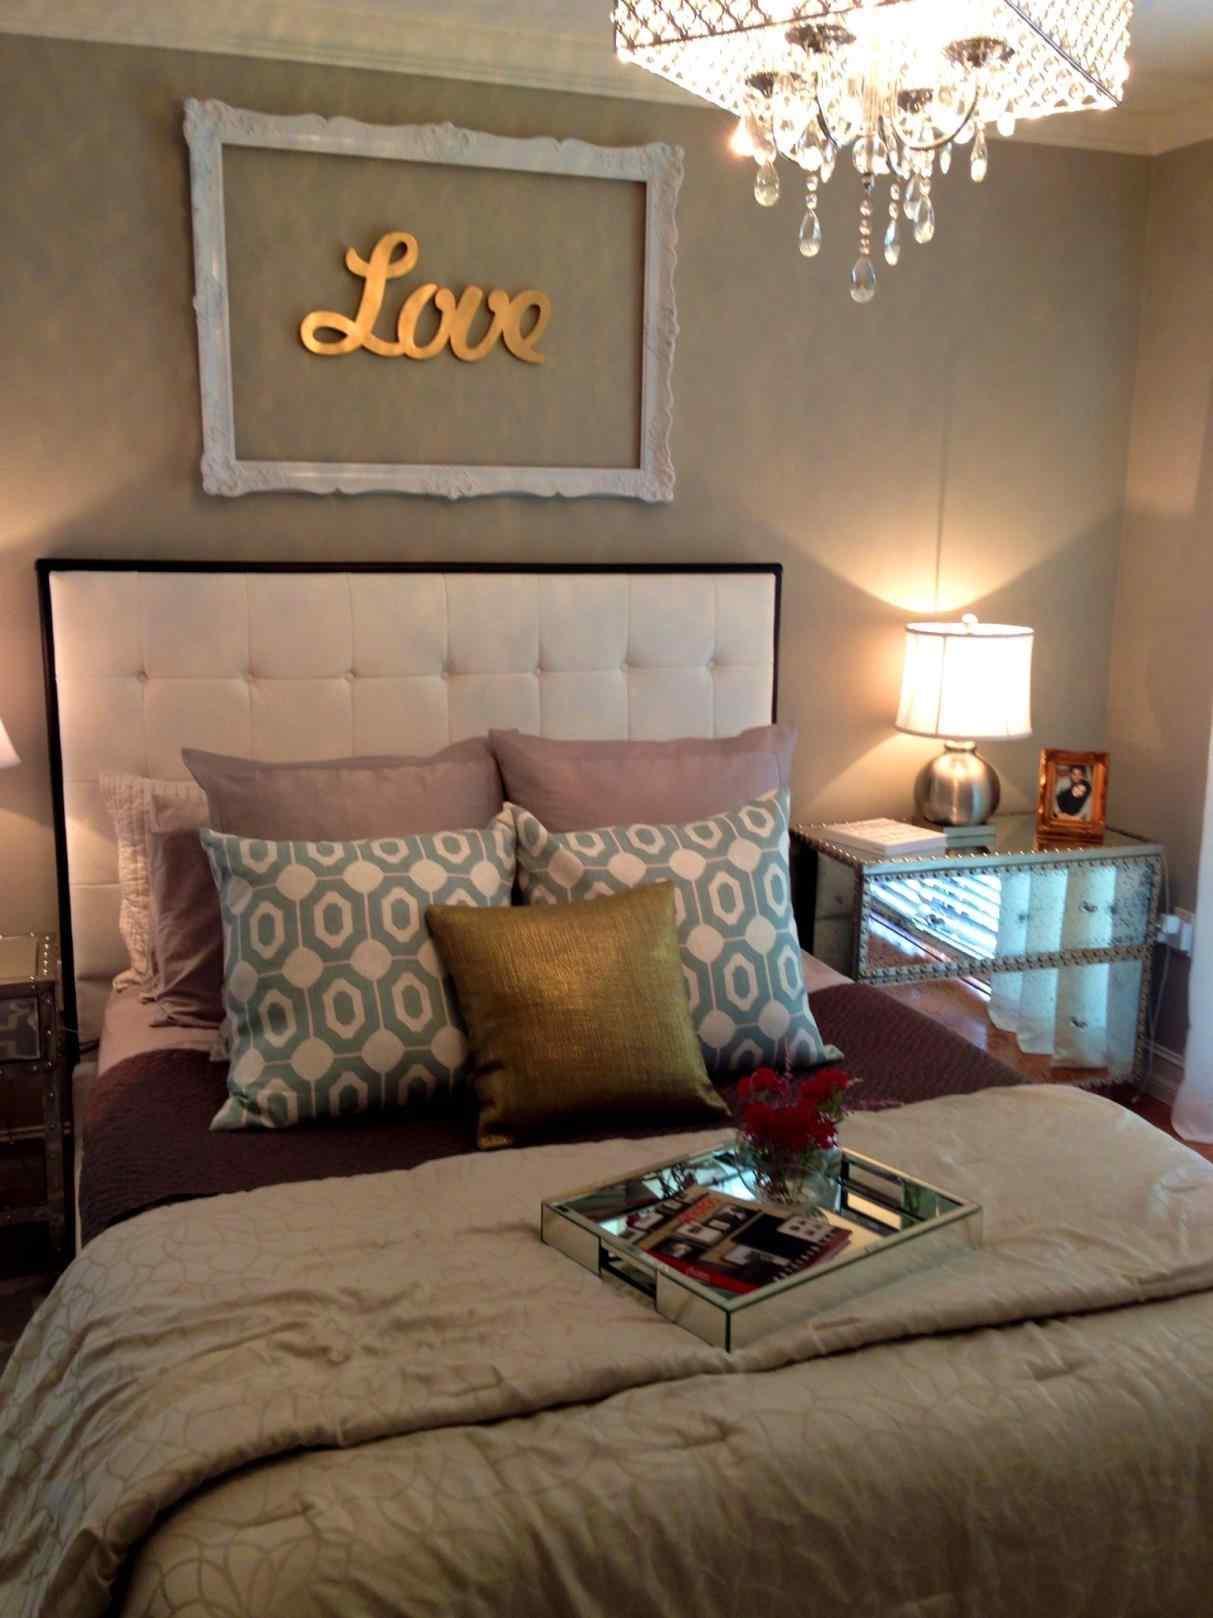 Uk Decoration Marvelous Rhidolzacom Gray Wallpaper - Rose Gold Black And White Bedroom - HD Wallpaper